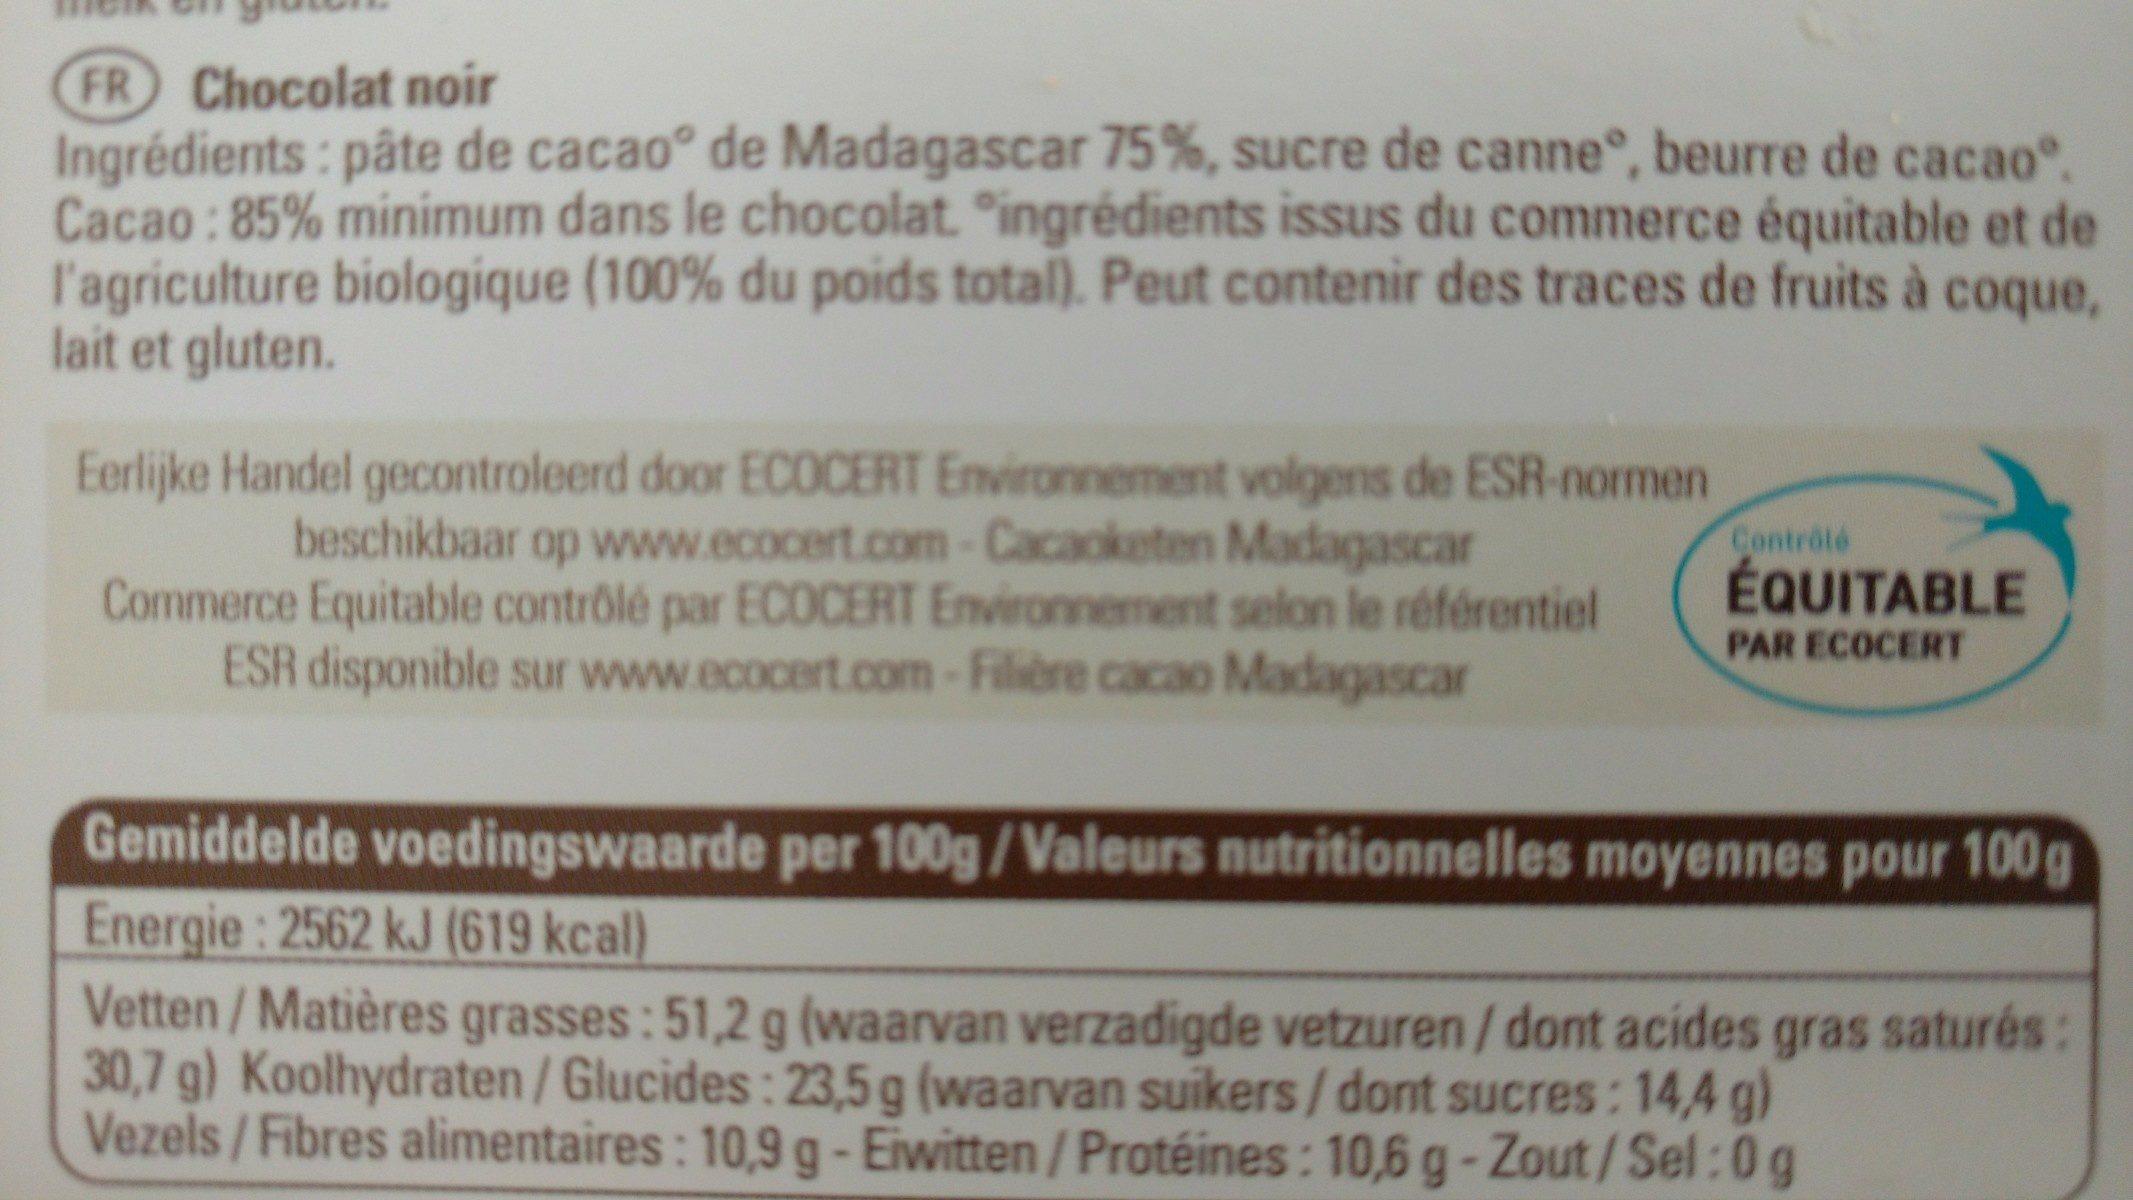 Ethiquable 85% Madagascar Cacao Grand Cru Sambirano - Ingrediënten - fr